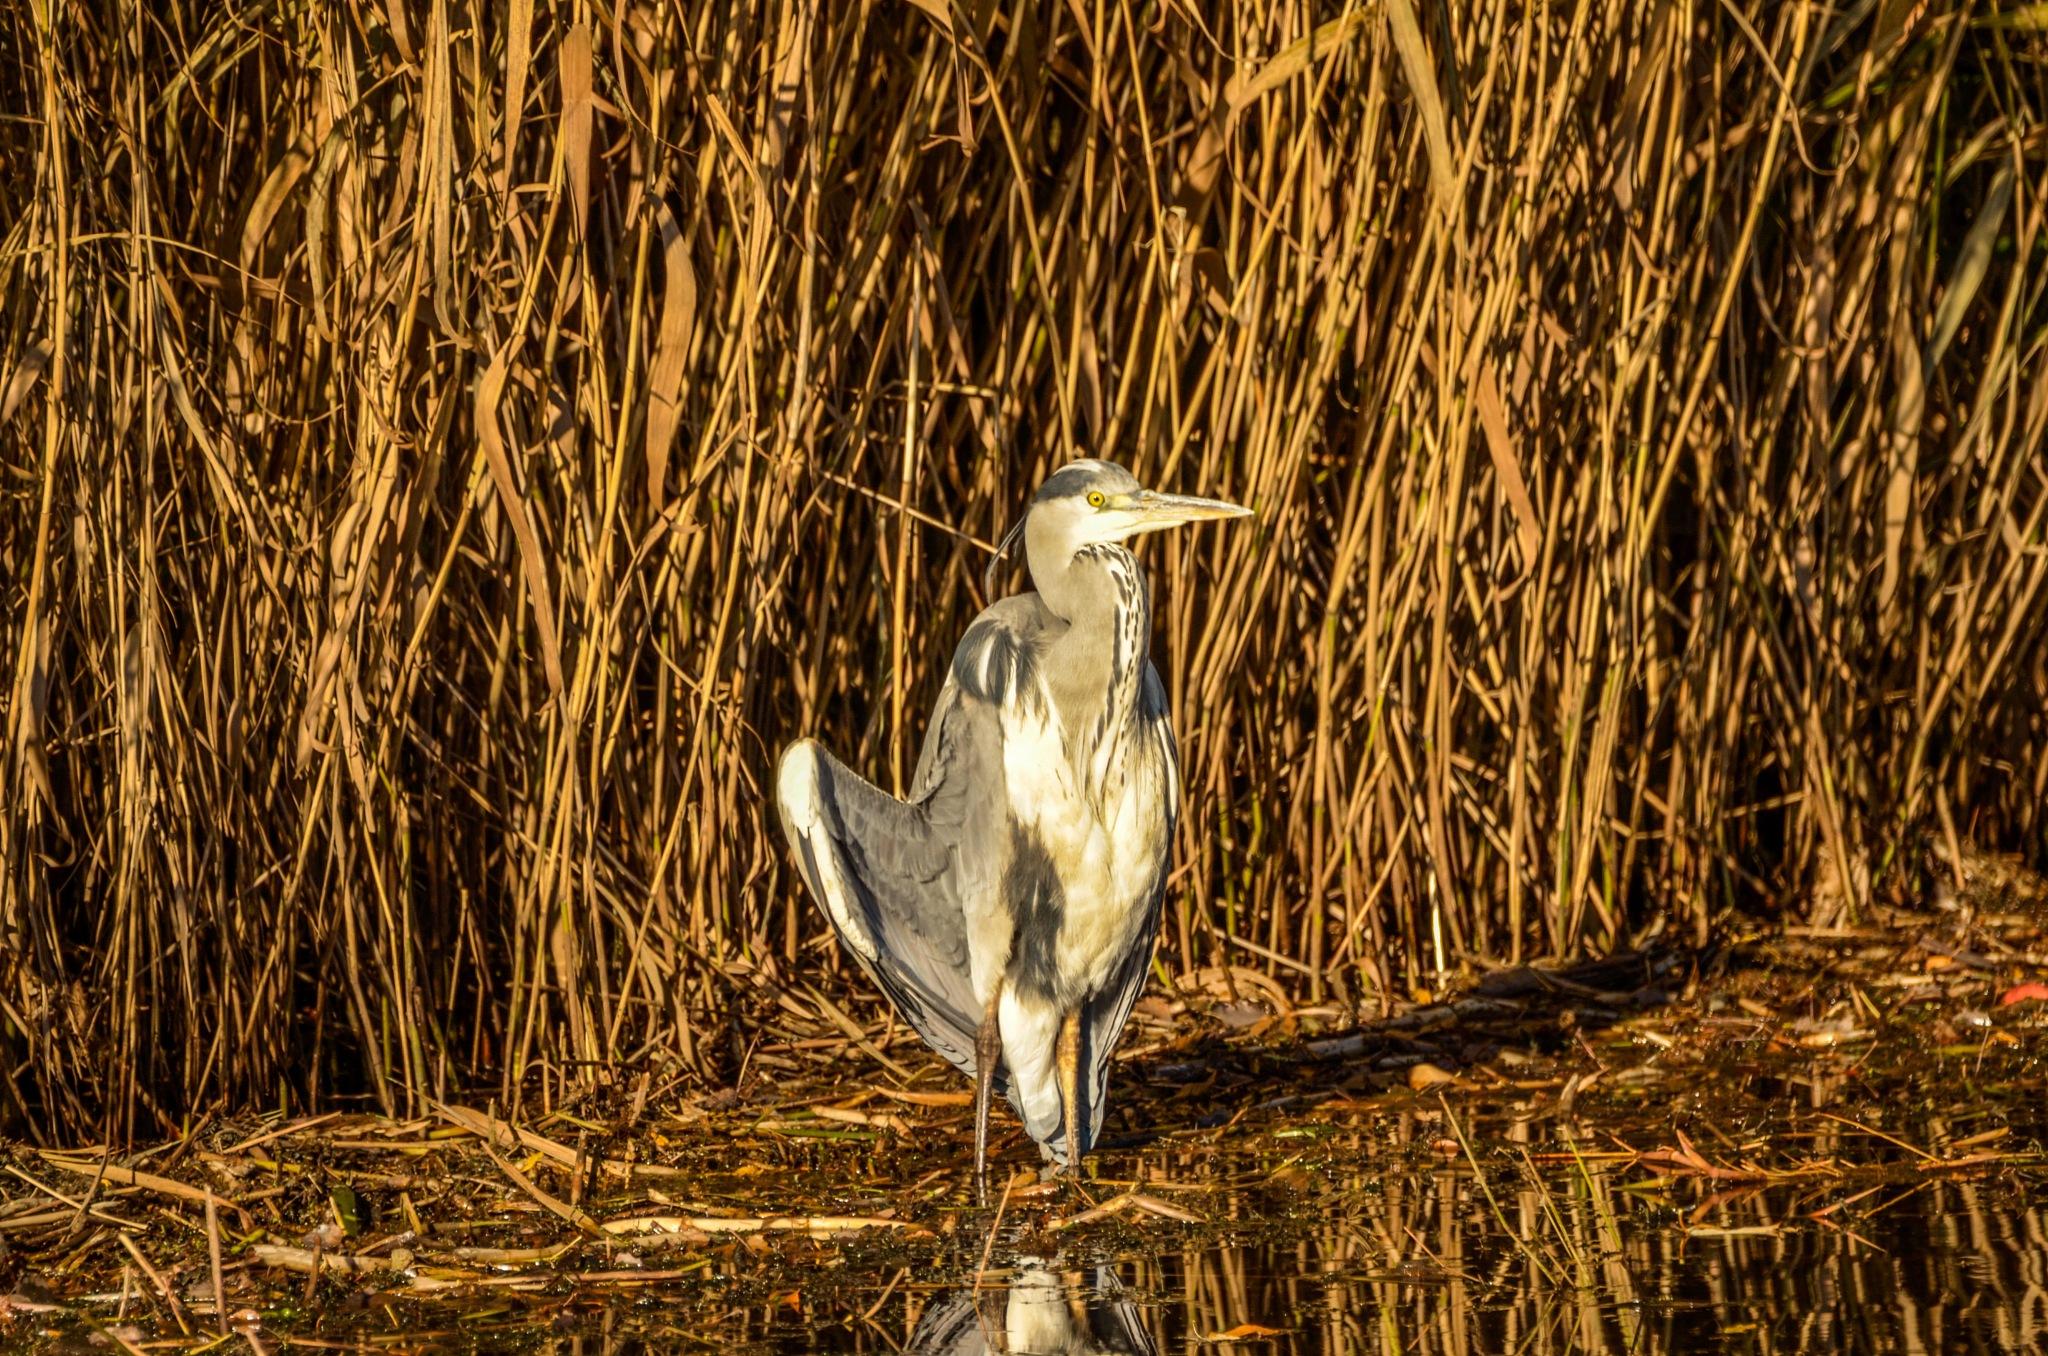 Heron sunbathing by Johnny Lythell